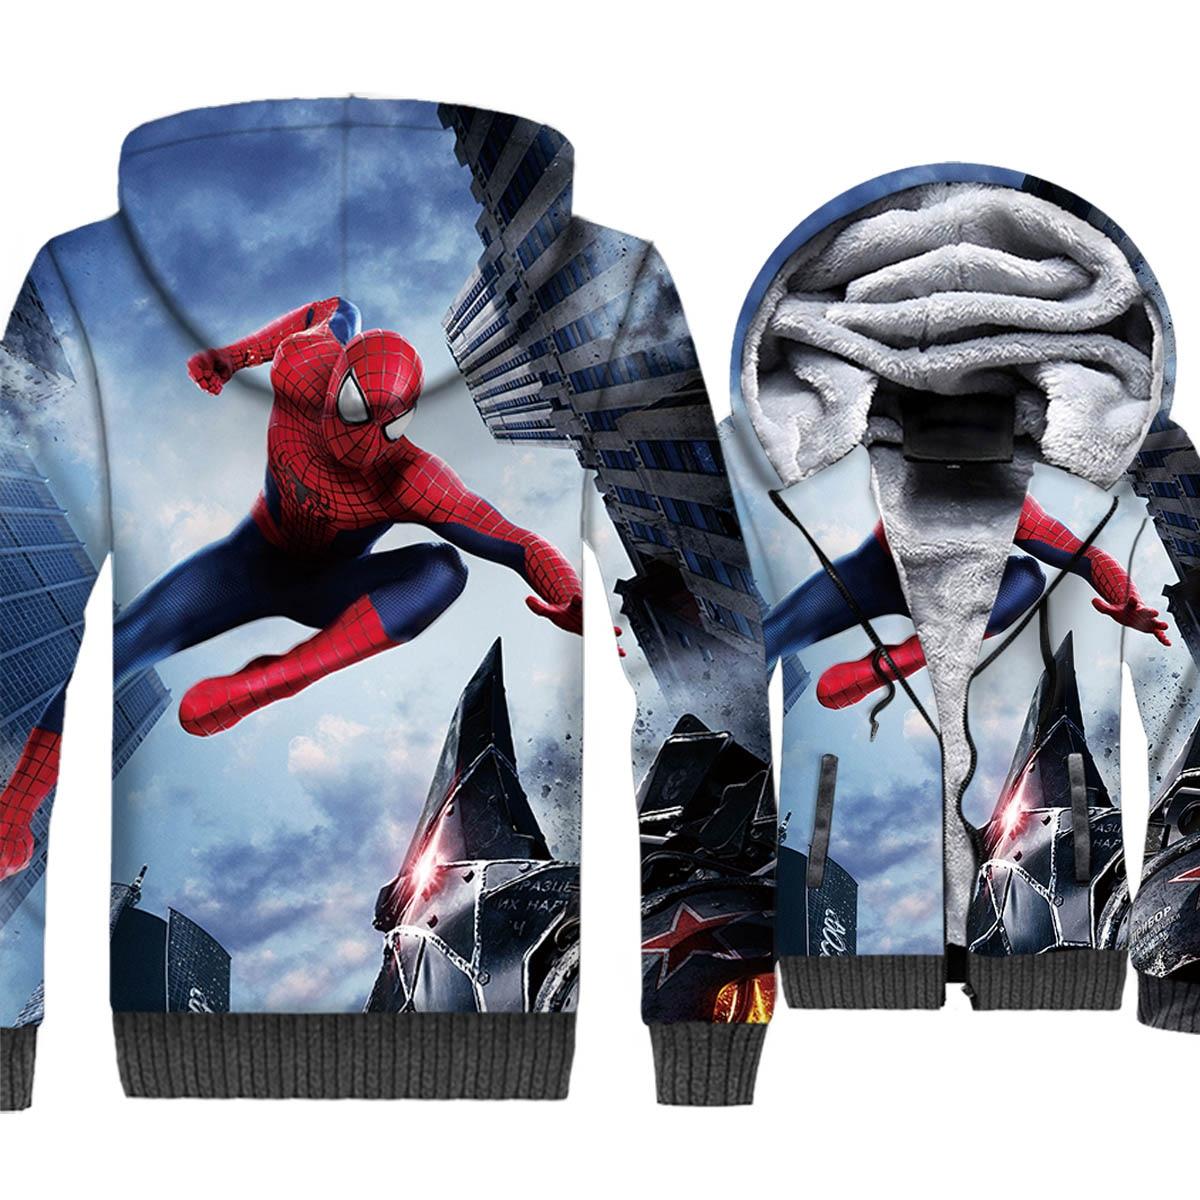 Spiderman 3D Hoodies 2019 Autumn Winter Jackets Men Fashion Thick Fleece Warm Sweatshirt Plus Size Men's Hooded Casual Tracksuit